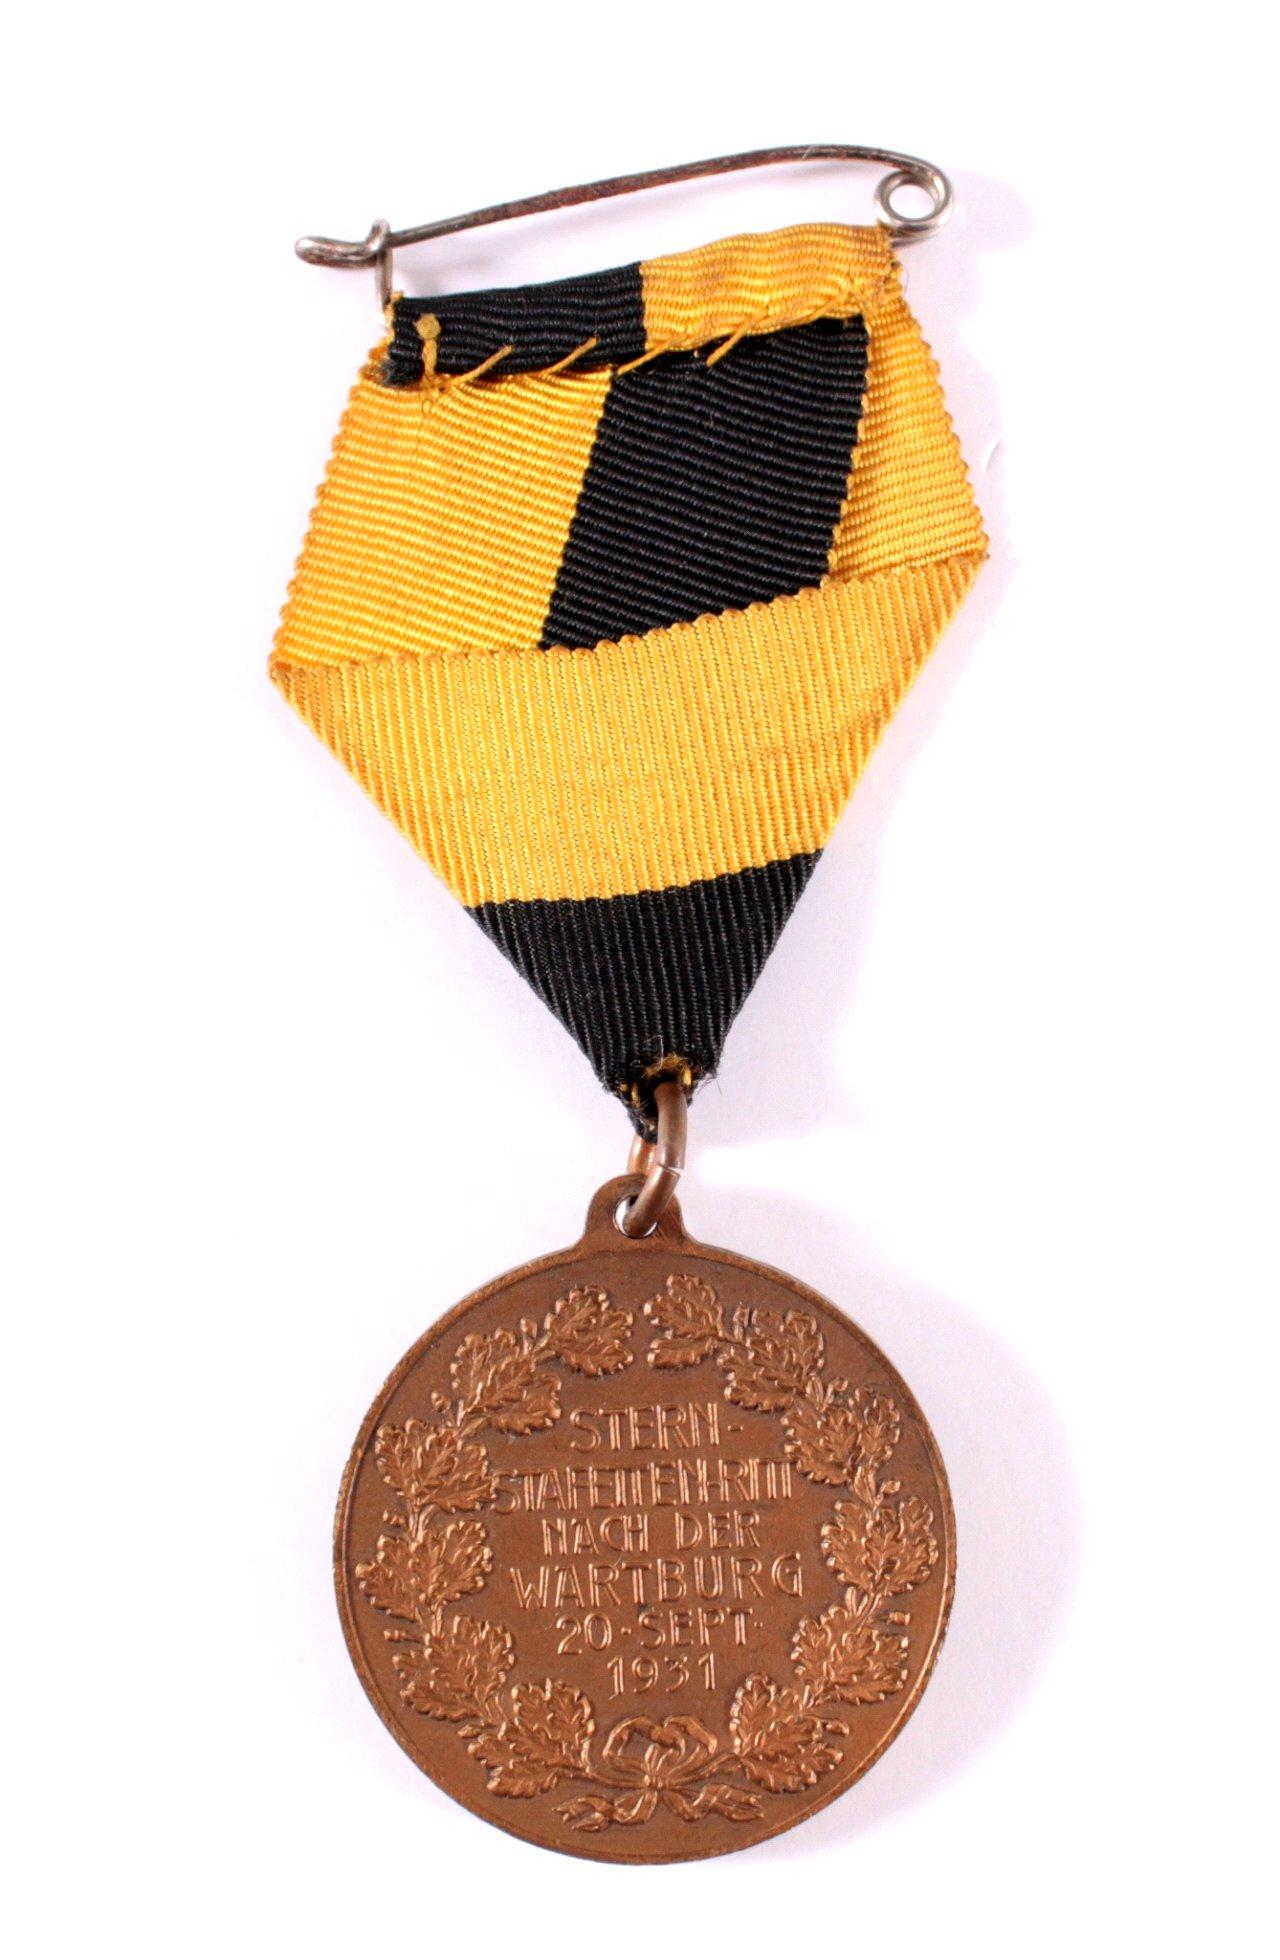 Medaille Stern Staffetten Ritt, Eisenach 1931-1